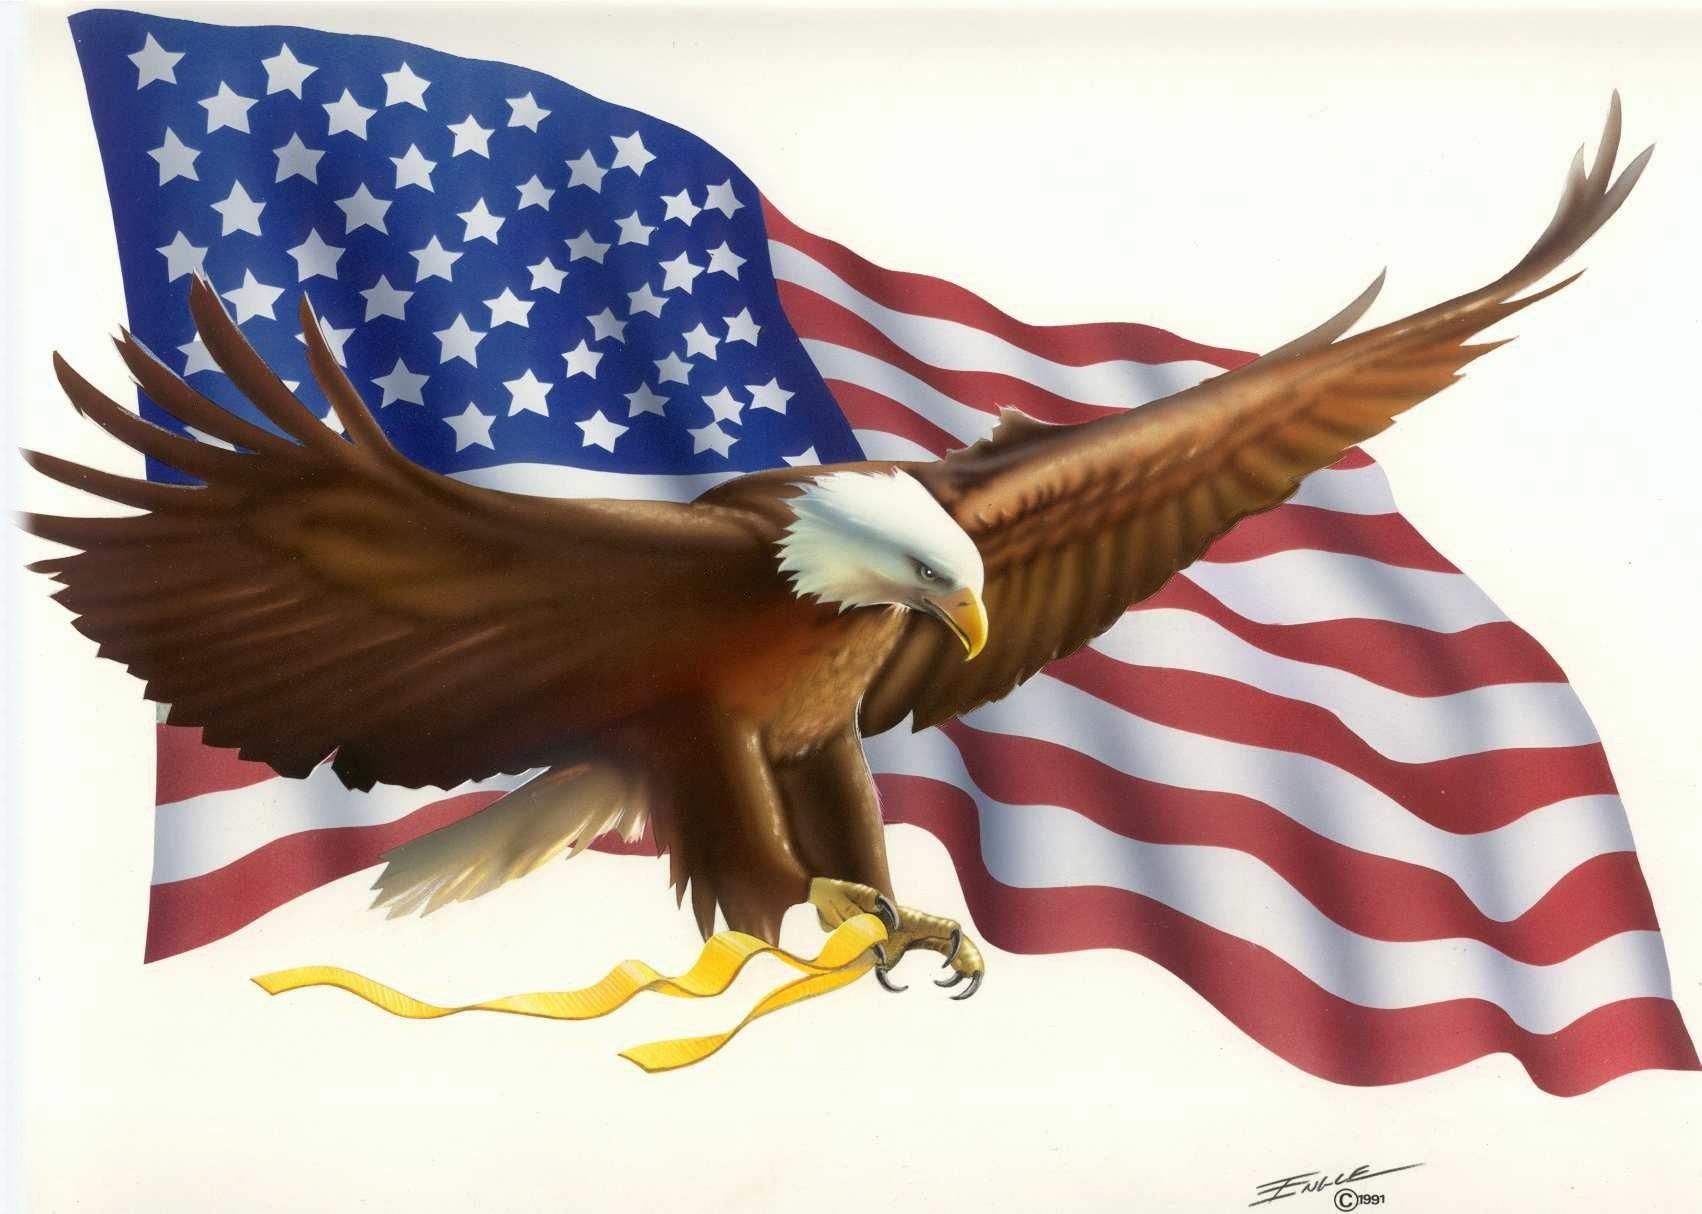 Free Download Eagle Flag Engle Bob Images At Clkercom Vector Clip Art 1702x1214 For Your Desktop Mobile Tablet Explore 44 Bald Eagle American Flag Wallpaper Bald Eagle American Flag